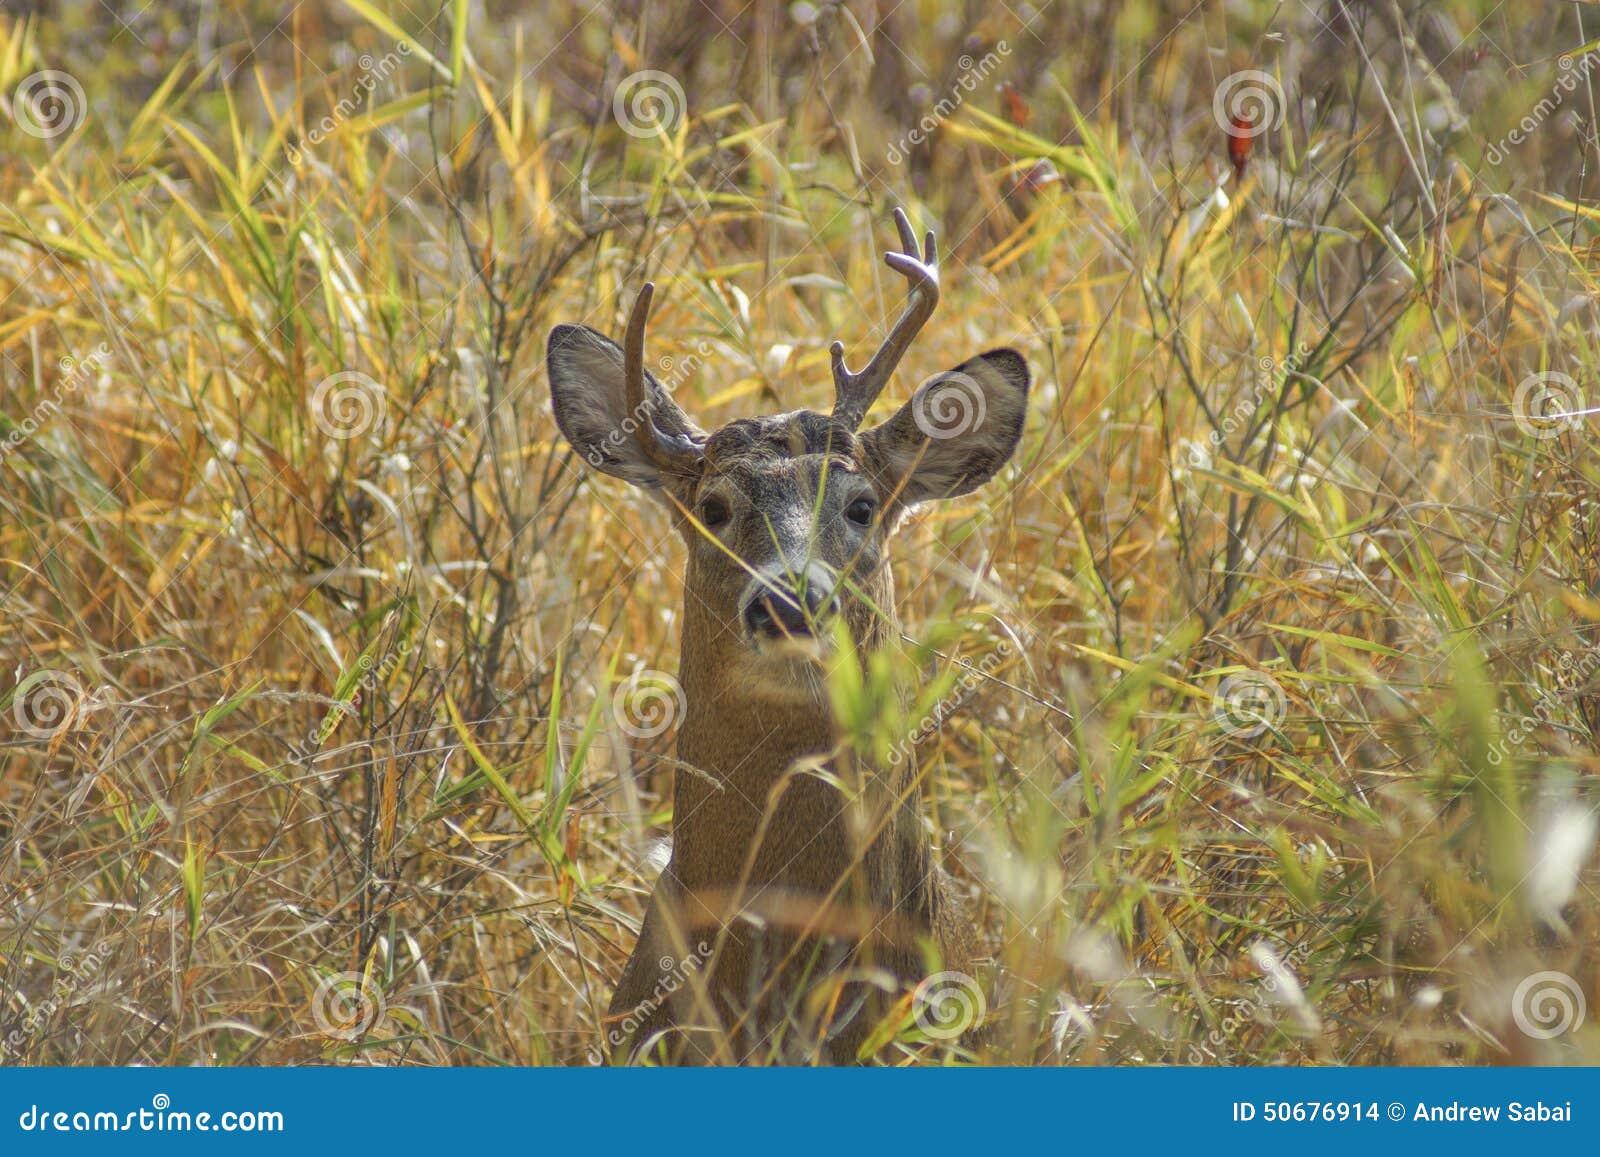 Download 白被盯梢的鹿 库存照片. 图片 包括有 牛仔, 空白, 白尾鹿, 抗氧剂, 查找, 眼睛, 车轮痕迹, 盯梢 - 50676914